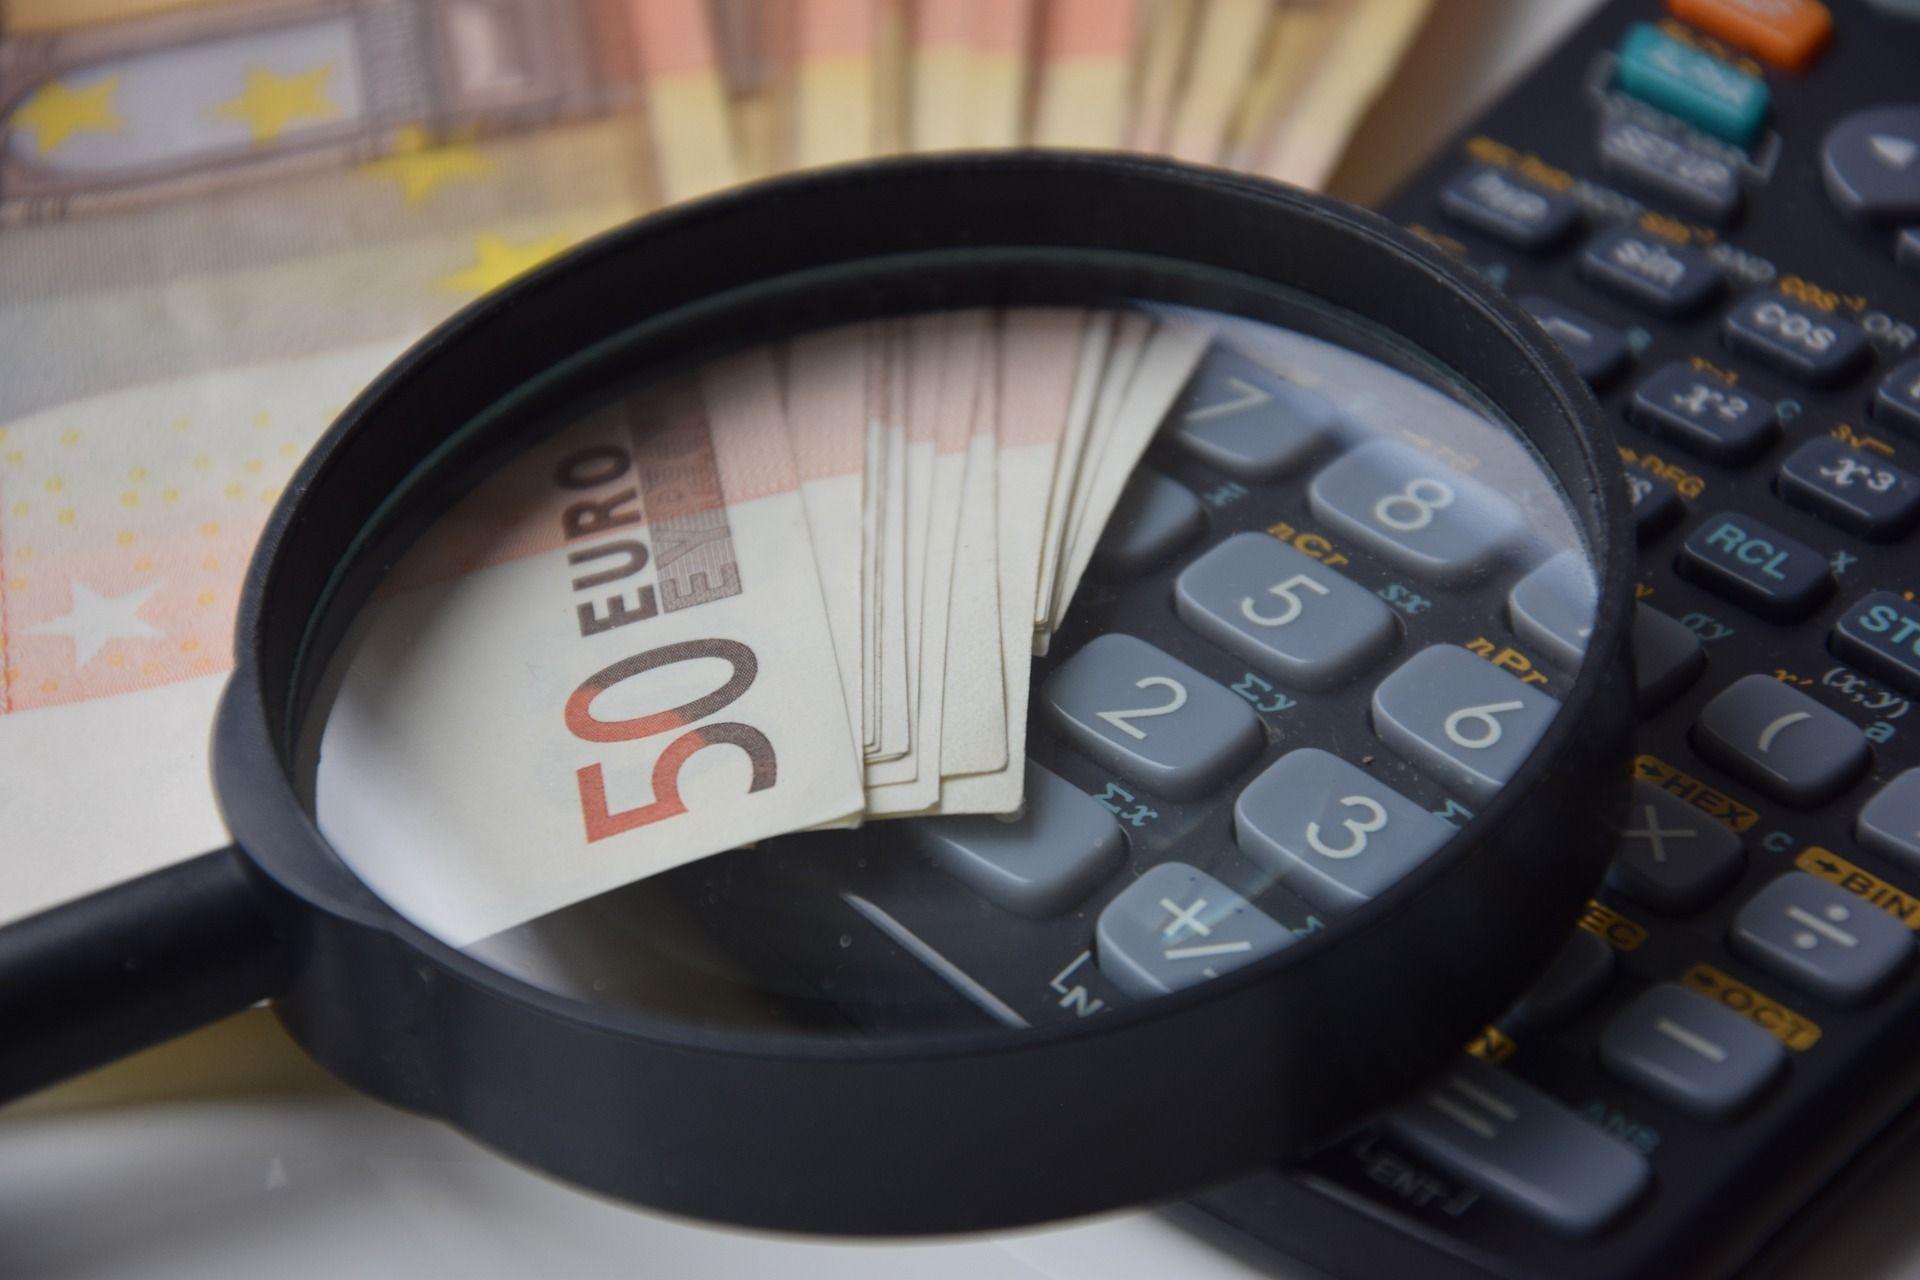 Calcolatrice lente d'ingrandimento banconote